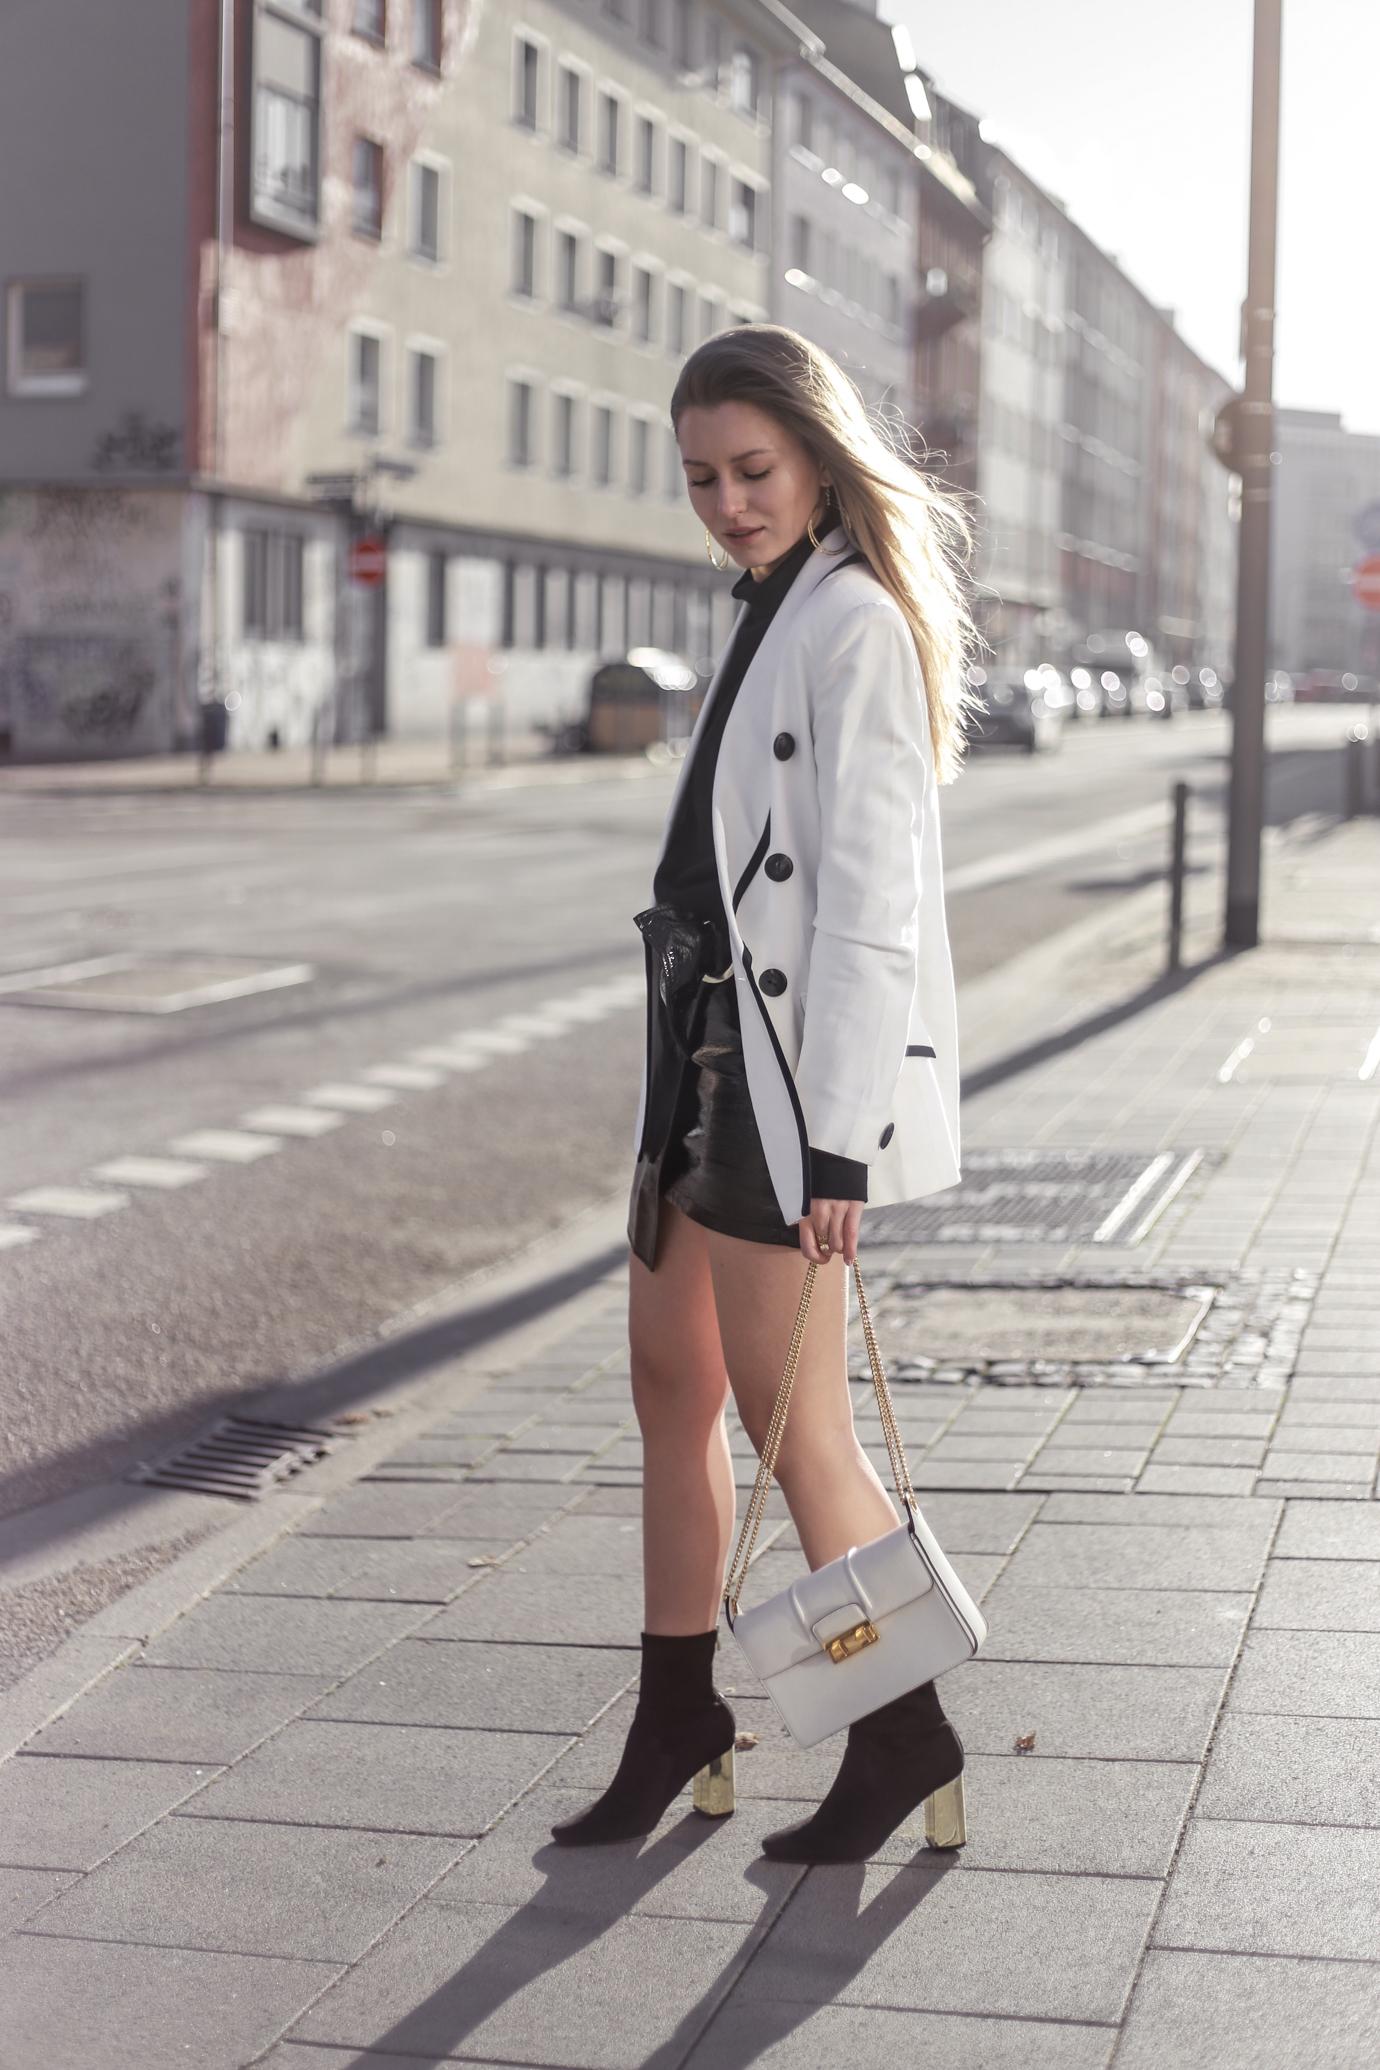 pvc-skirt-vinyl-dior-vintage-livia-auer-7550